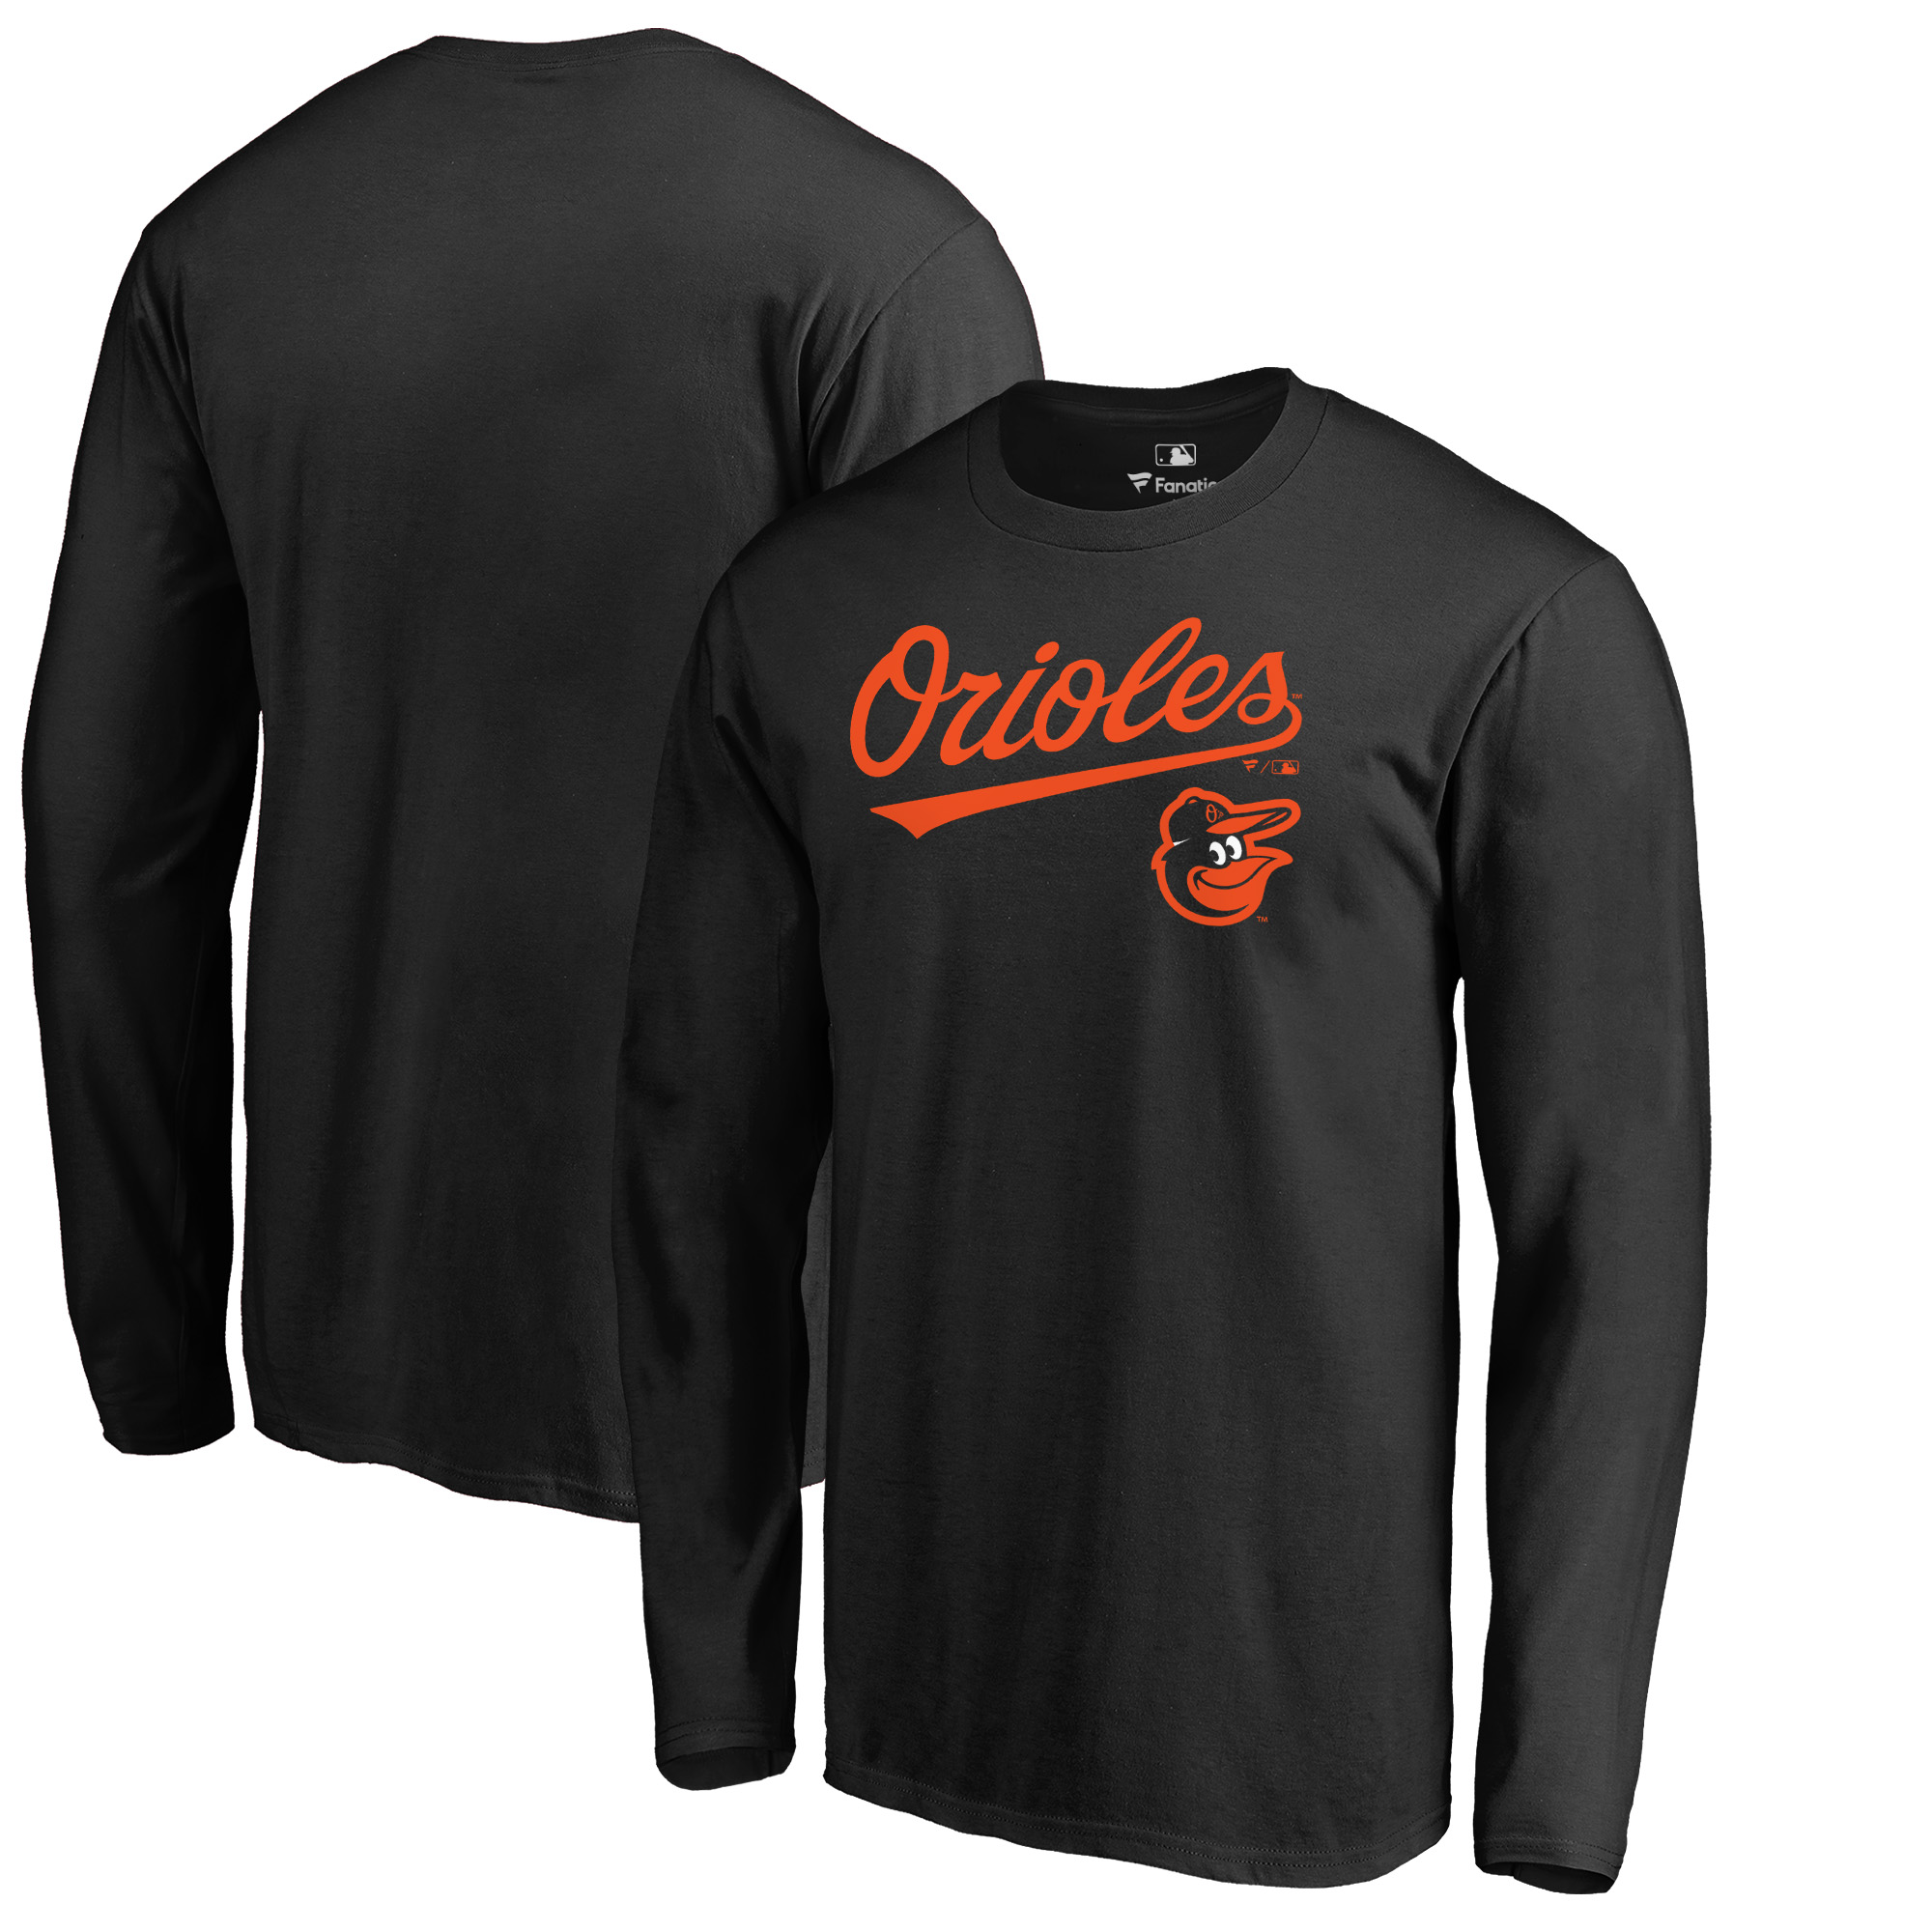 Baltimore Orioles Fanatics Branded Big & Tall Team Lockup Long Sleeve T-Shirt - Black